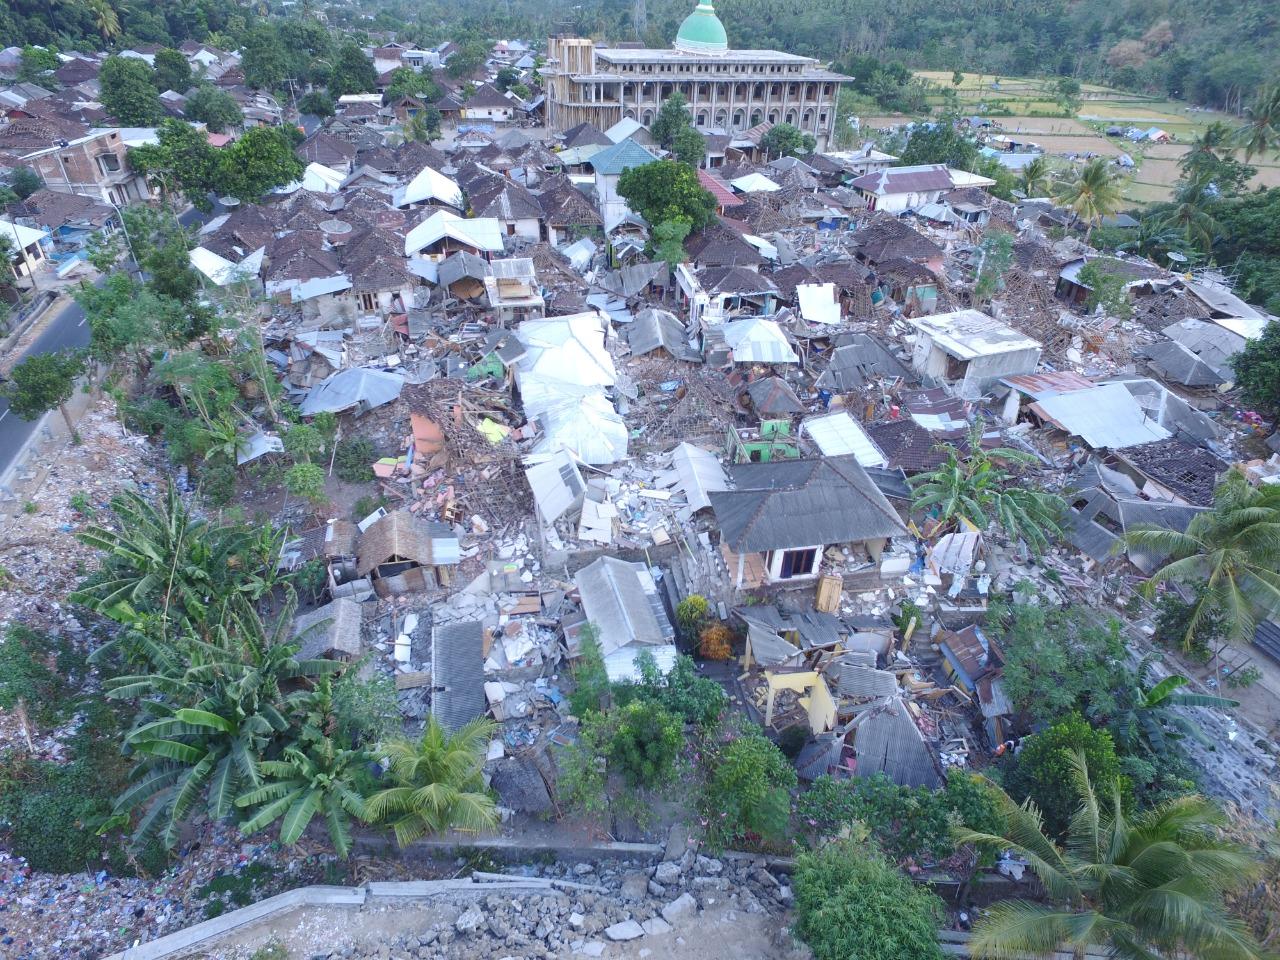 https: img.okezone.com content 2021 08 05 337 2451206 tiga-tahun-gempa-besar-ntb-melihat-pembangunan-kembali-kota-yang-luluh-lantak-Sa55IohHJS.jpg